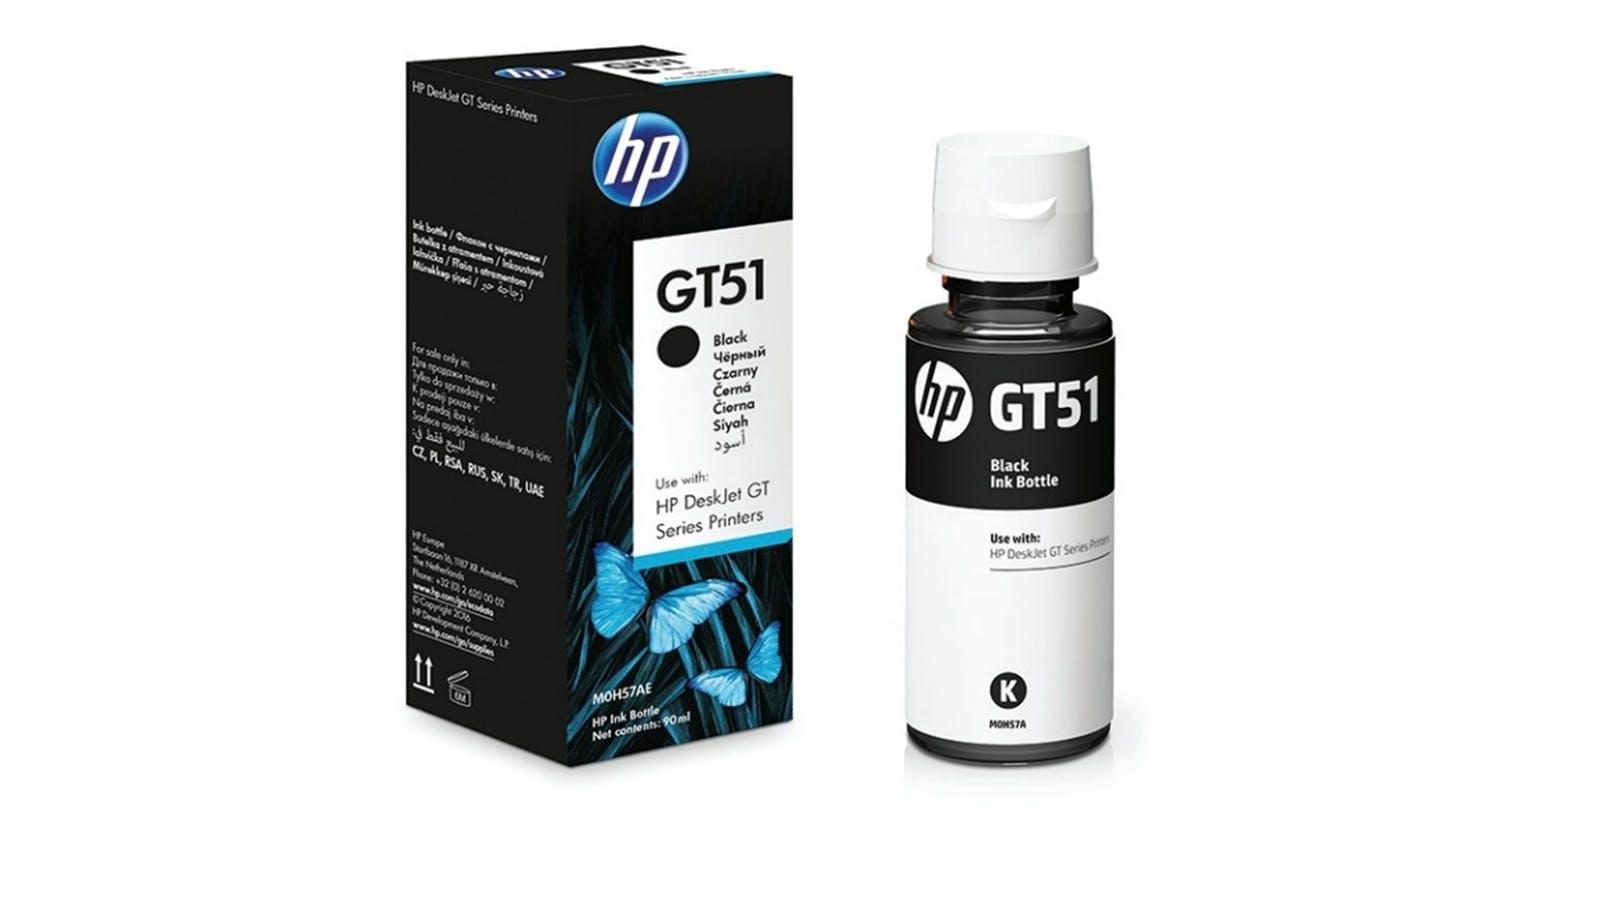 Home :: Computing :: Printing & Scanning :: Inks, Toners & Paper :: HP  M0H57AA GT51 Black Original Ink Bottle